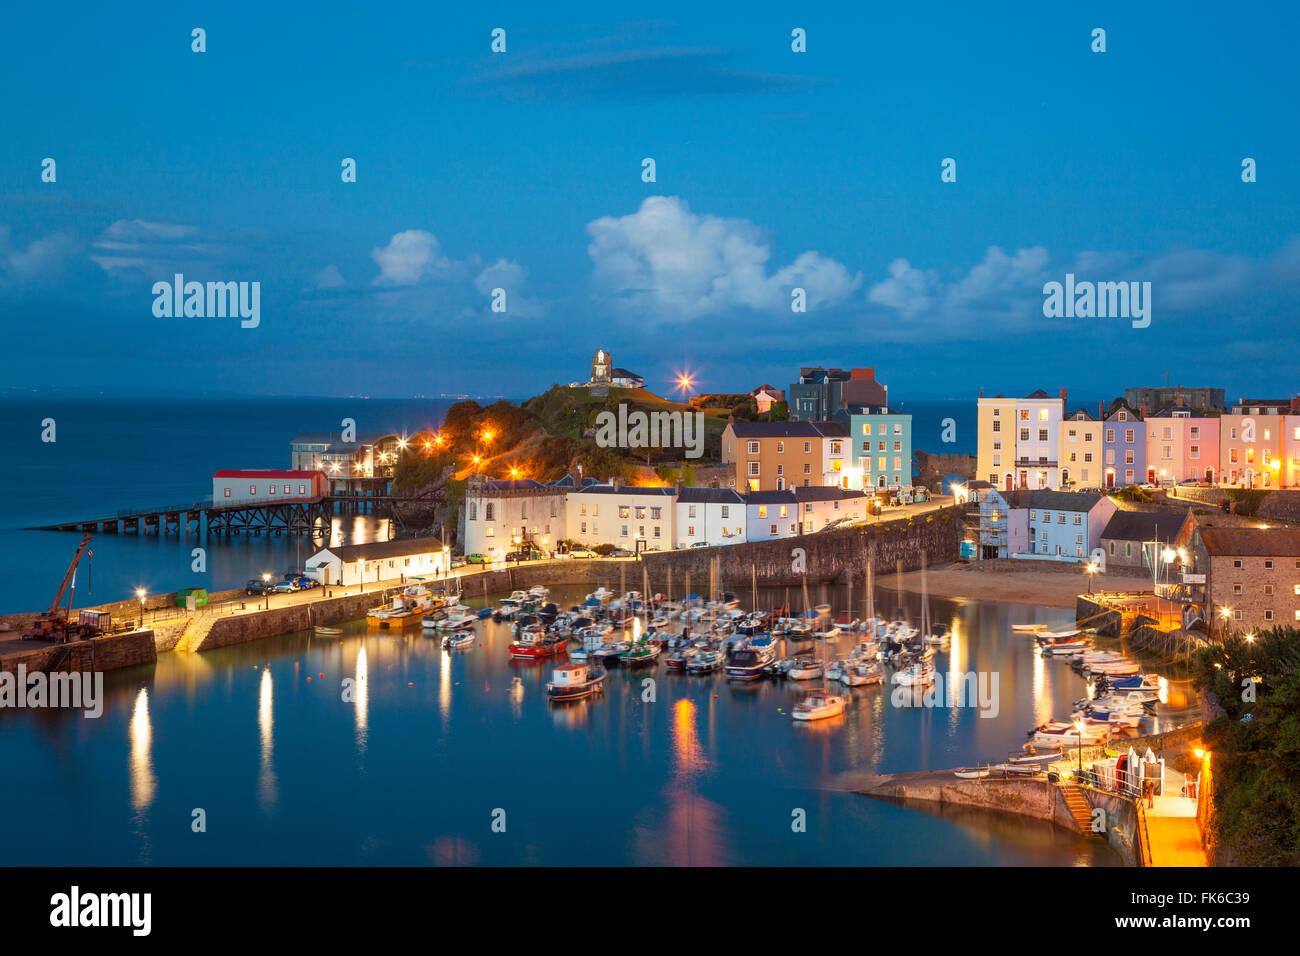 Tenby, Pembrokeshire, Wales, United Kingdom, Europe - Stock Image